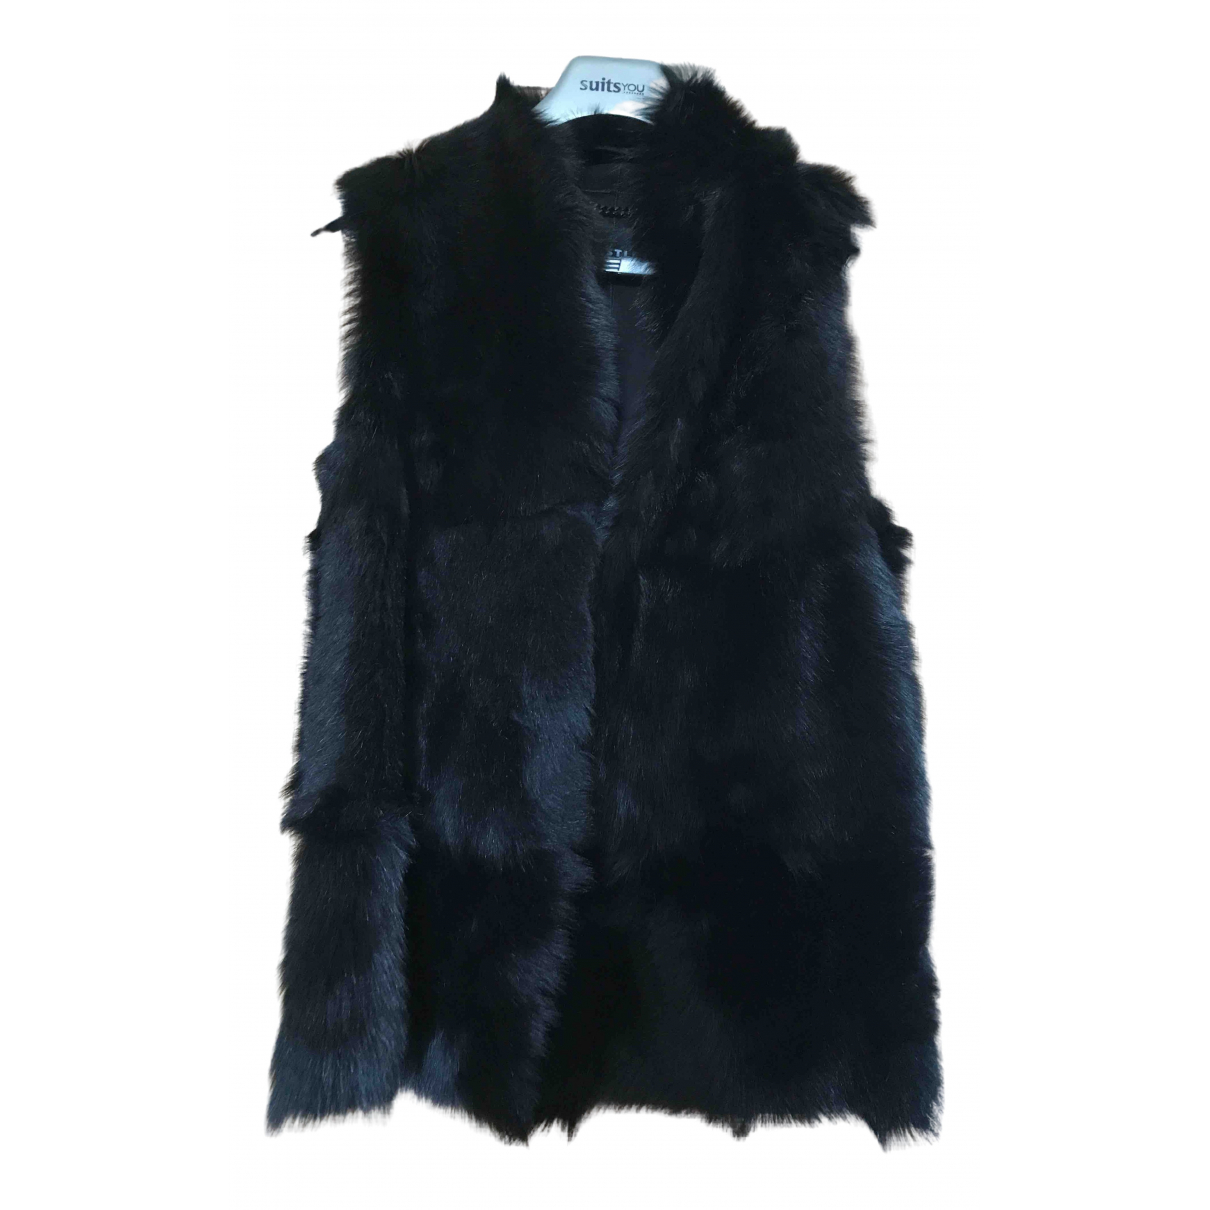 Whistles \N Black Faux fur jacket for Women M International